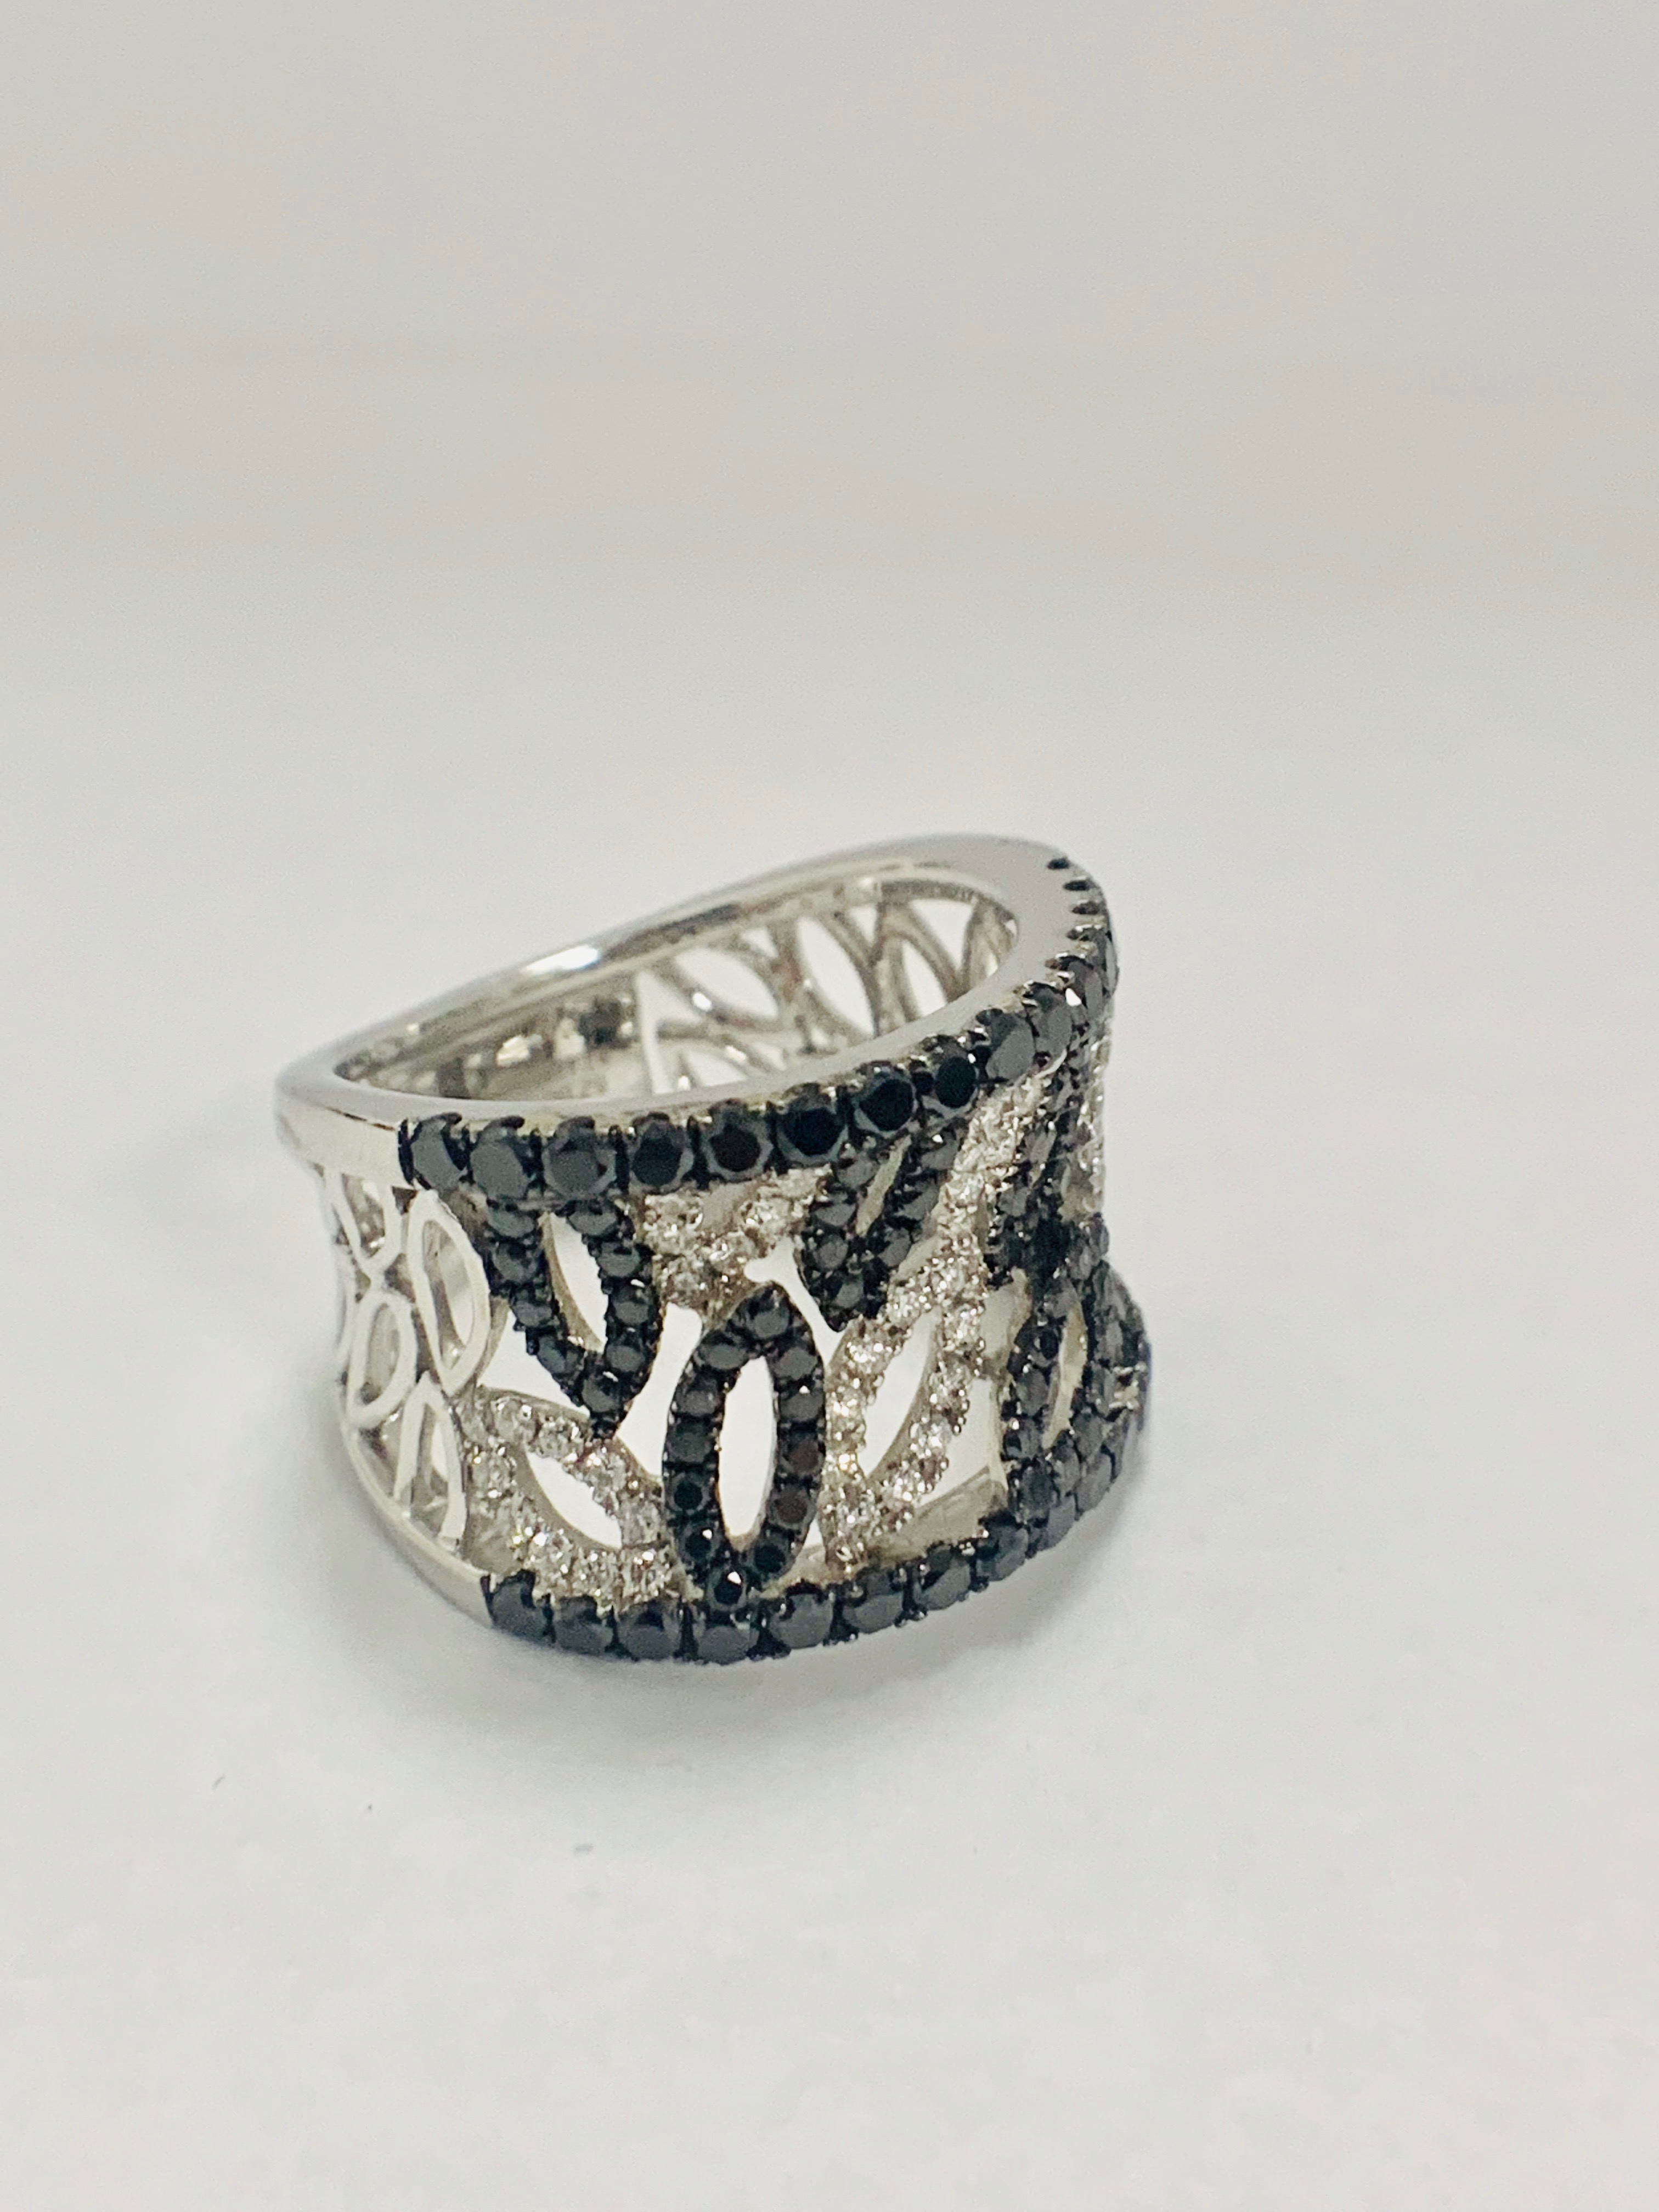 18ct White Gold Diamond ring featuring 90 round cut, black Diamonds (1.14ct TBDW) - Image 11 of 15